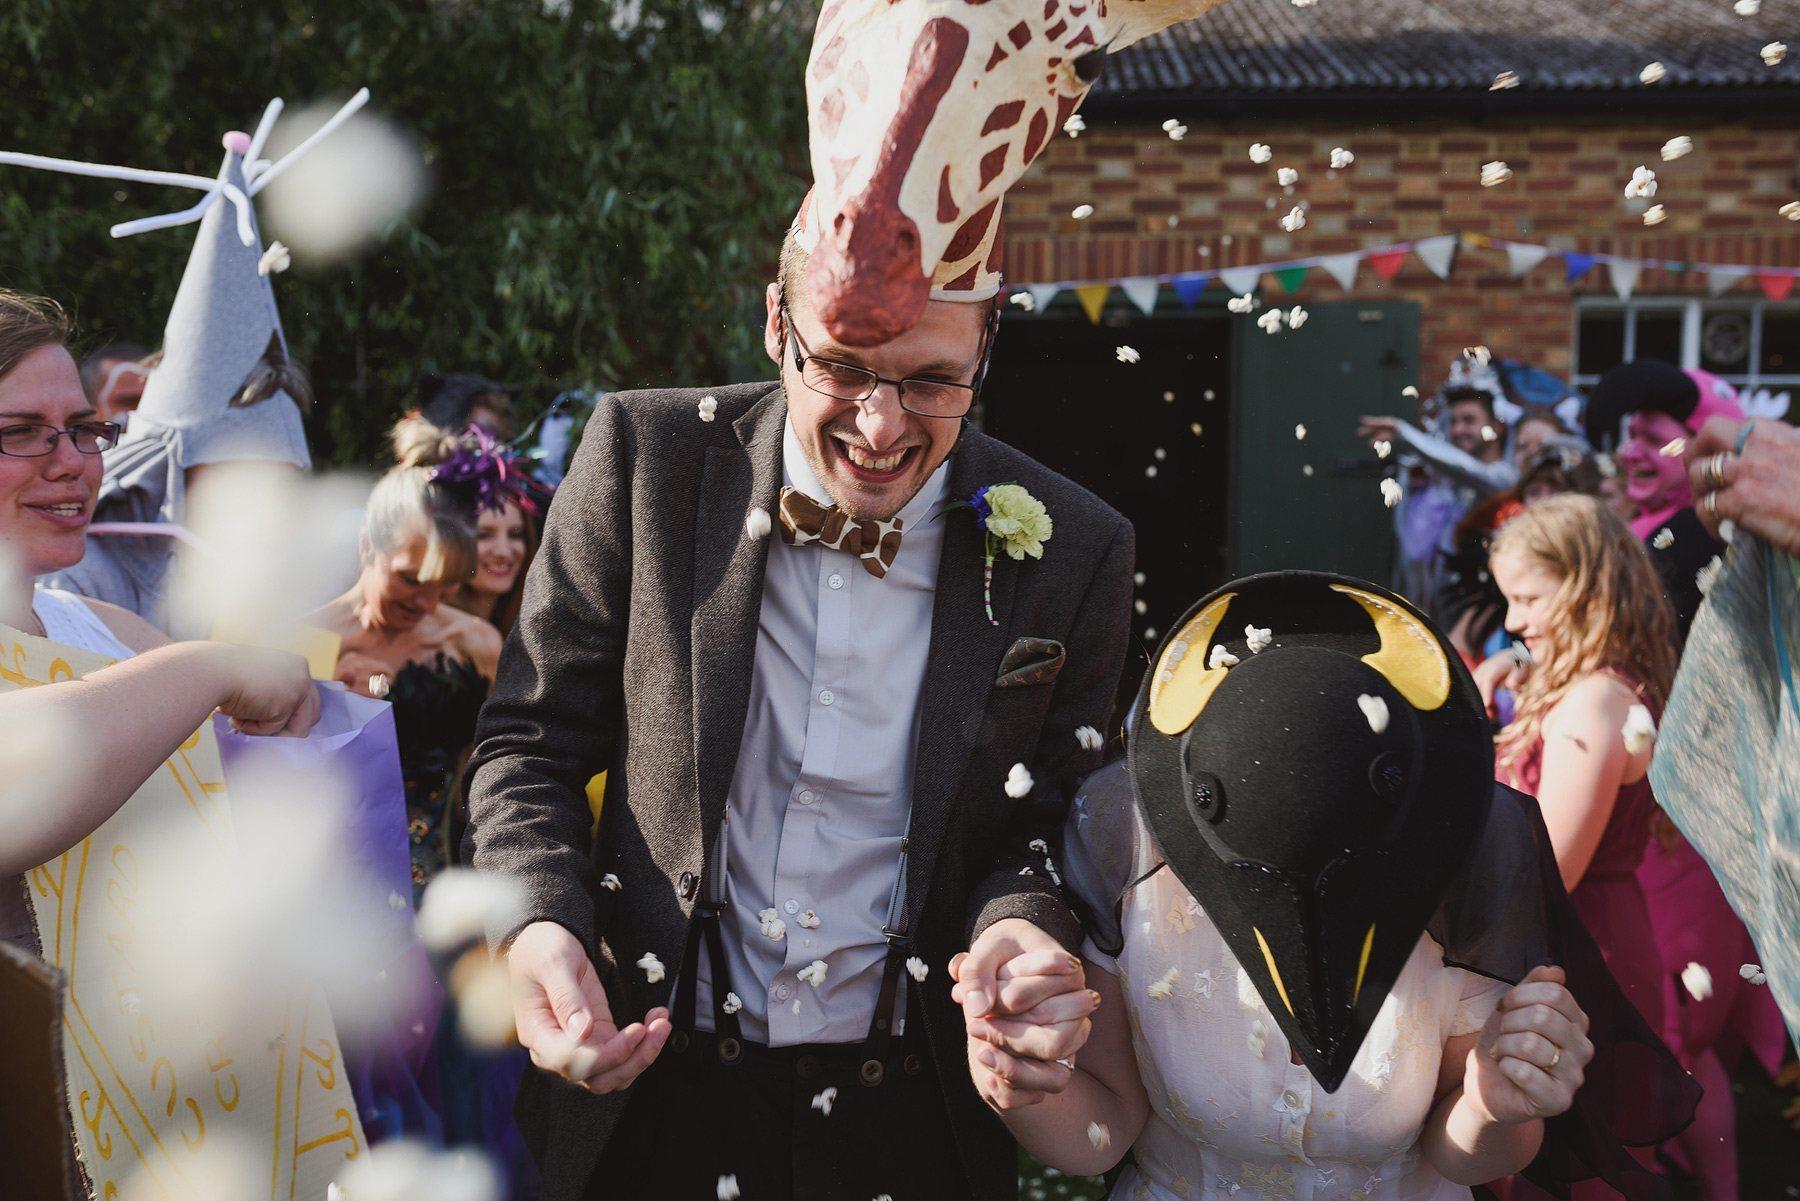 popcorn confetti at a wedding